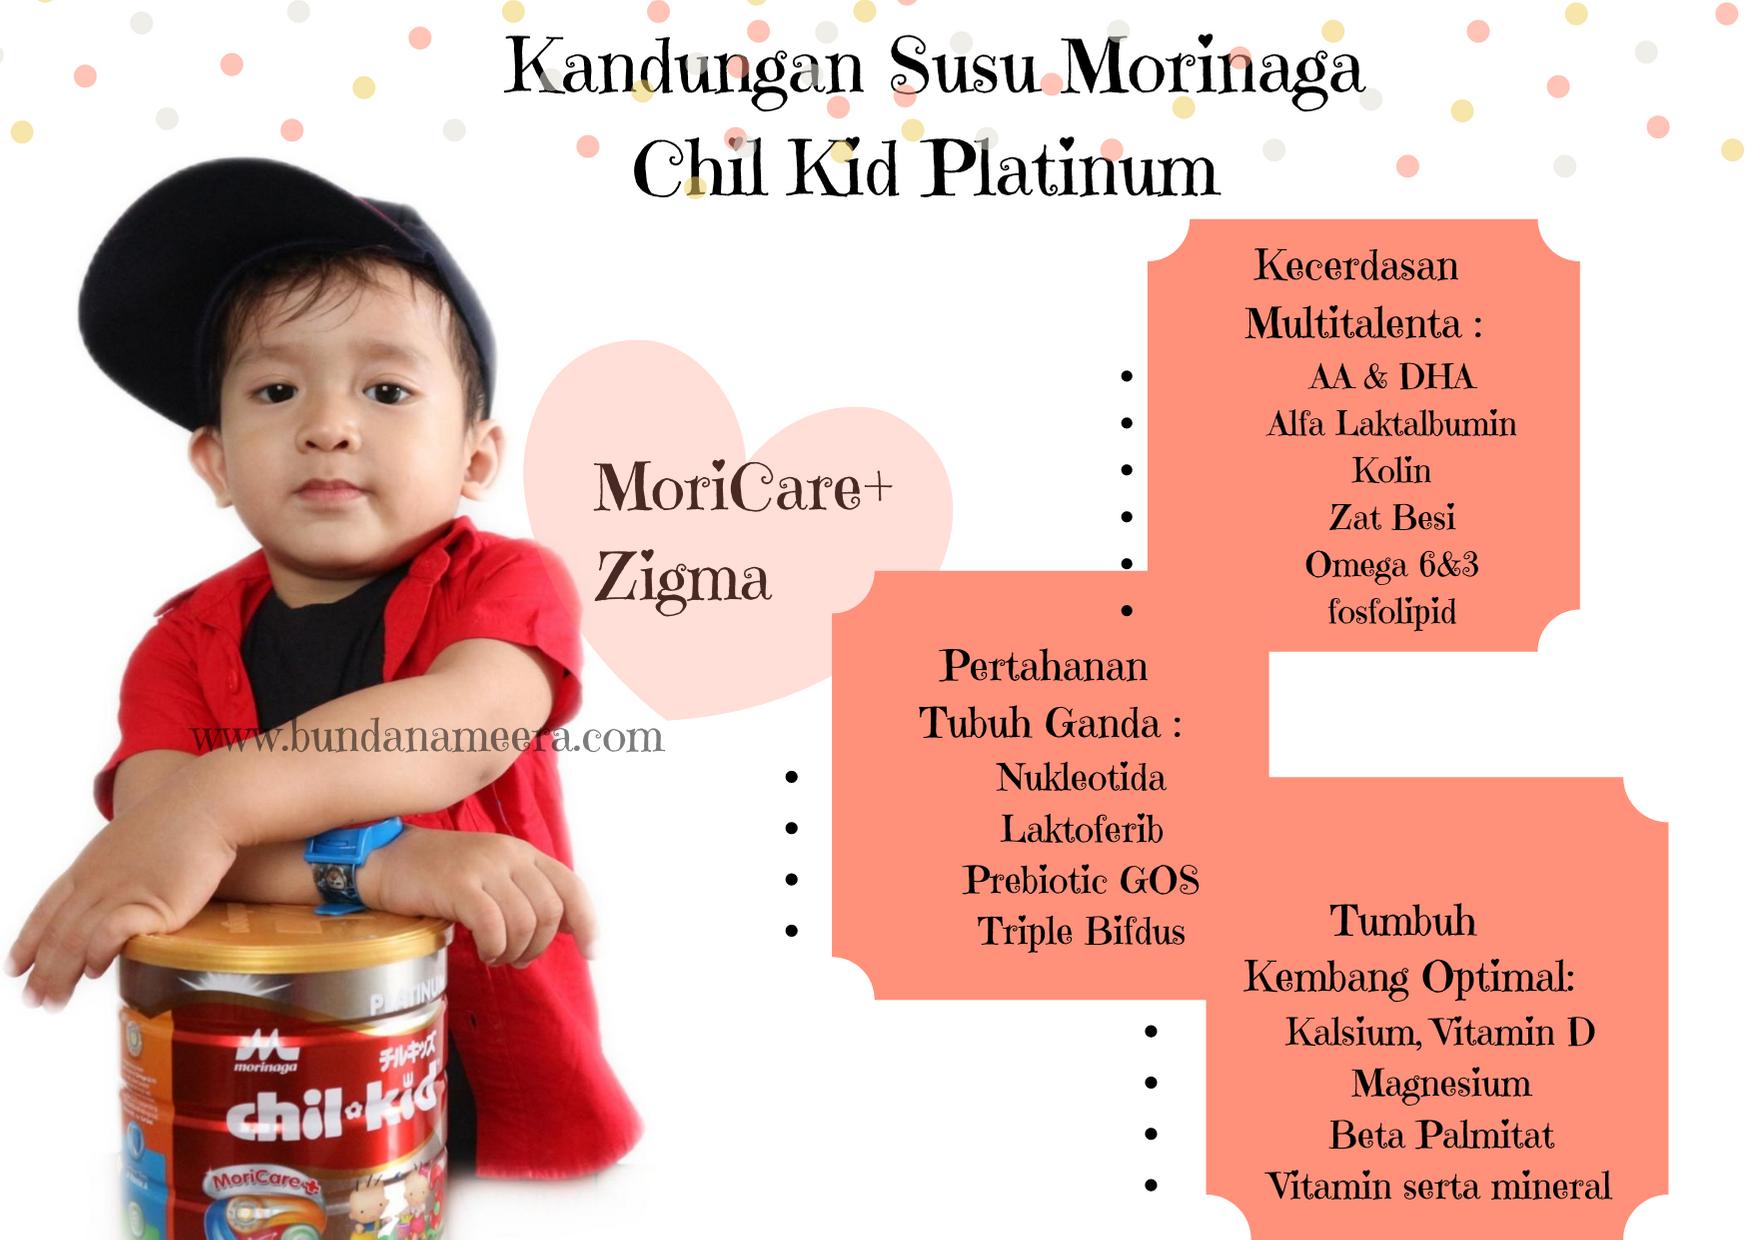 moricare+ zigma kandungan susu morinaga penunjang pertumbuhan